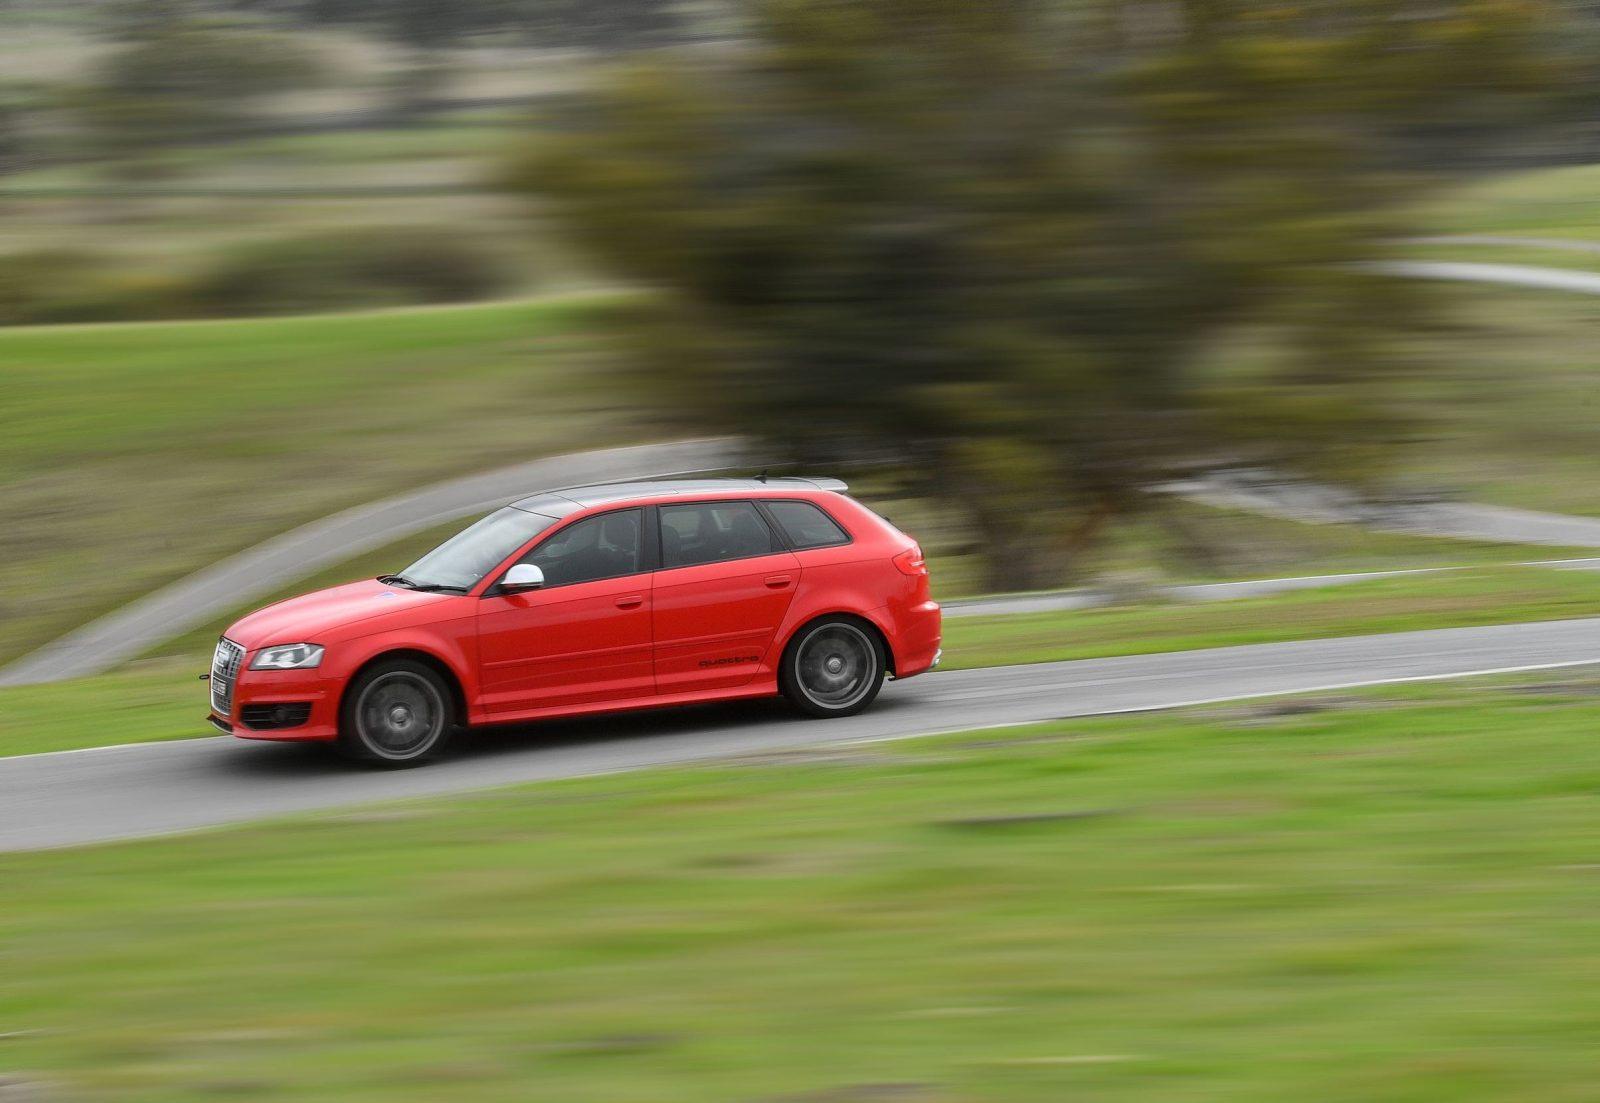 Audi at Collingrove Hillclimb